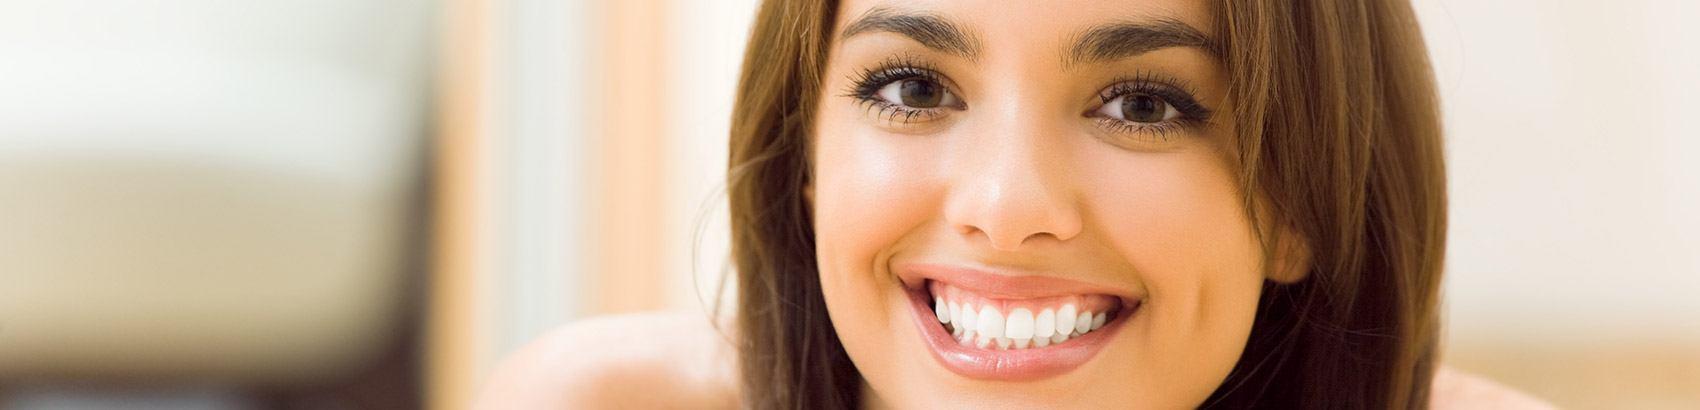 Teeth Whitening - Asuncion Dental Group